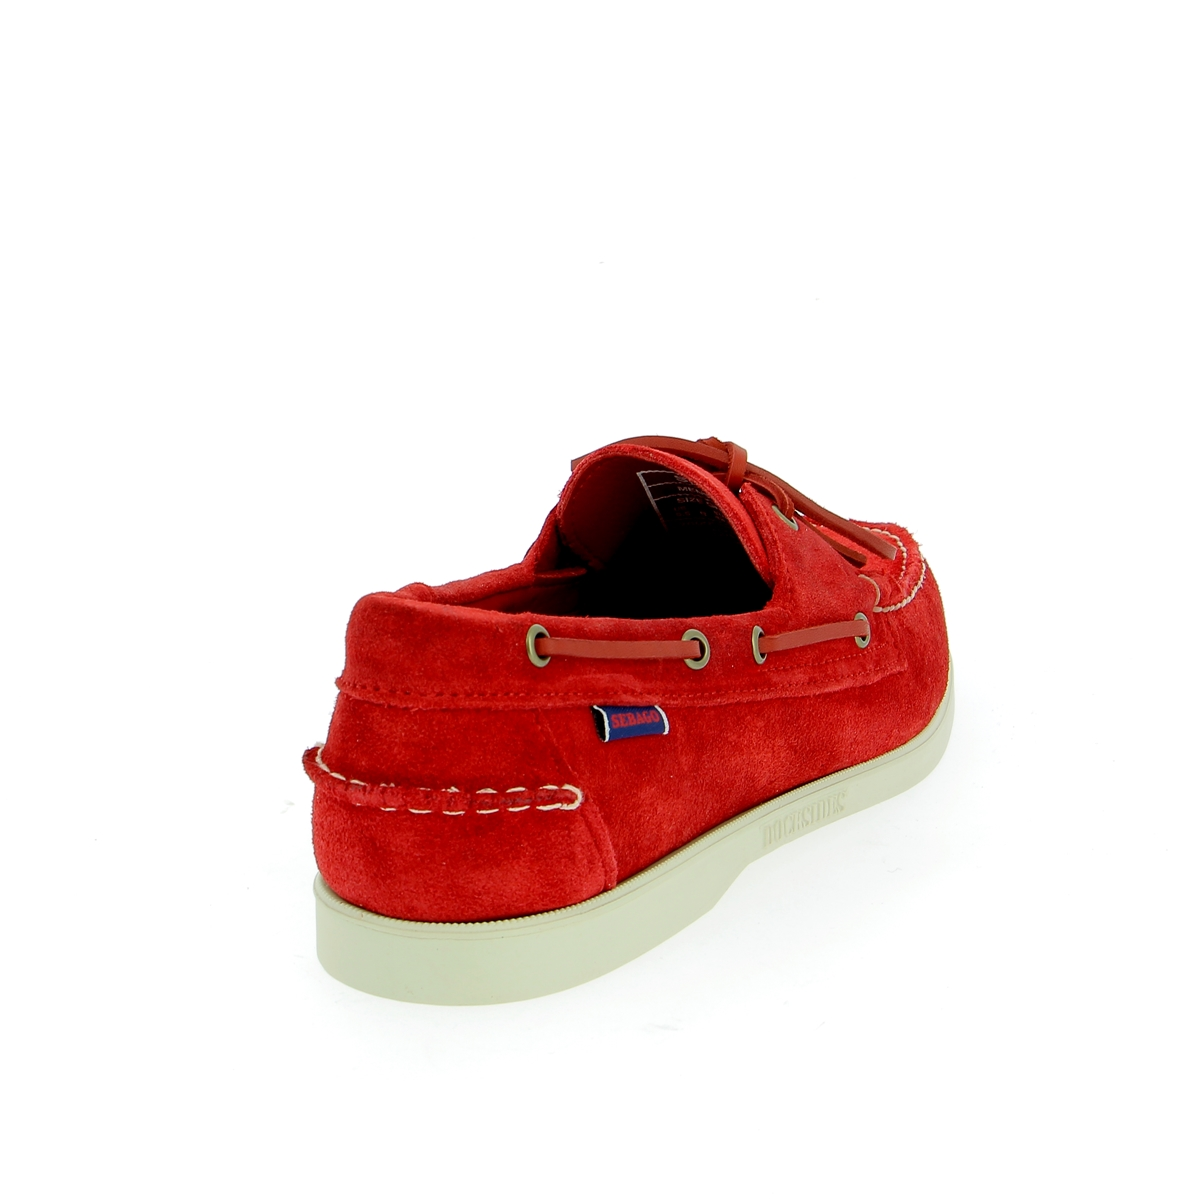 Sebago Bootschoenen rood